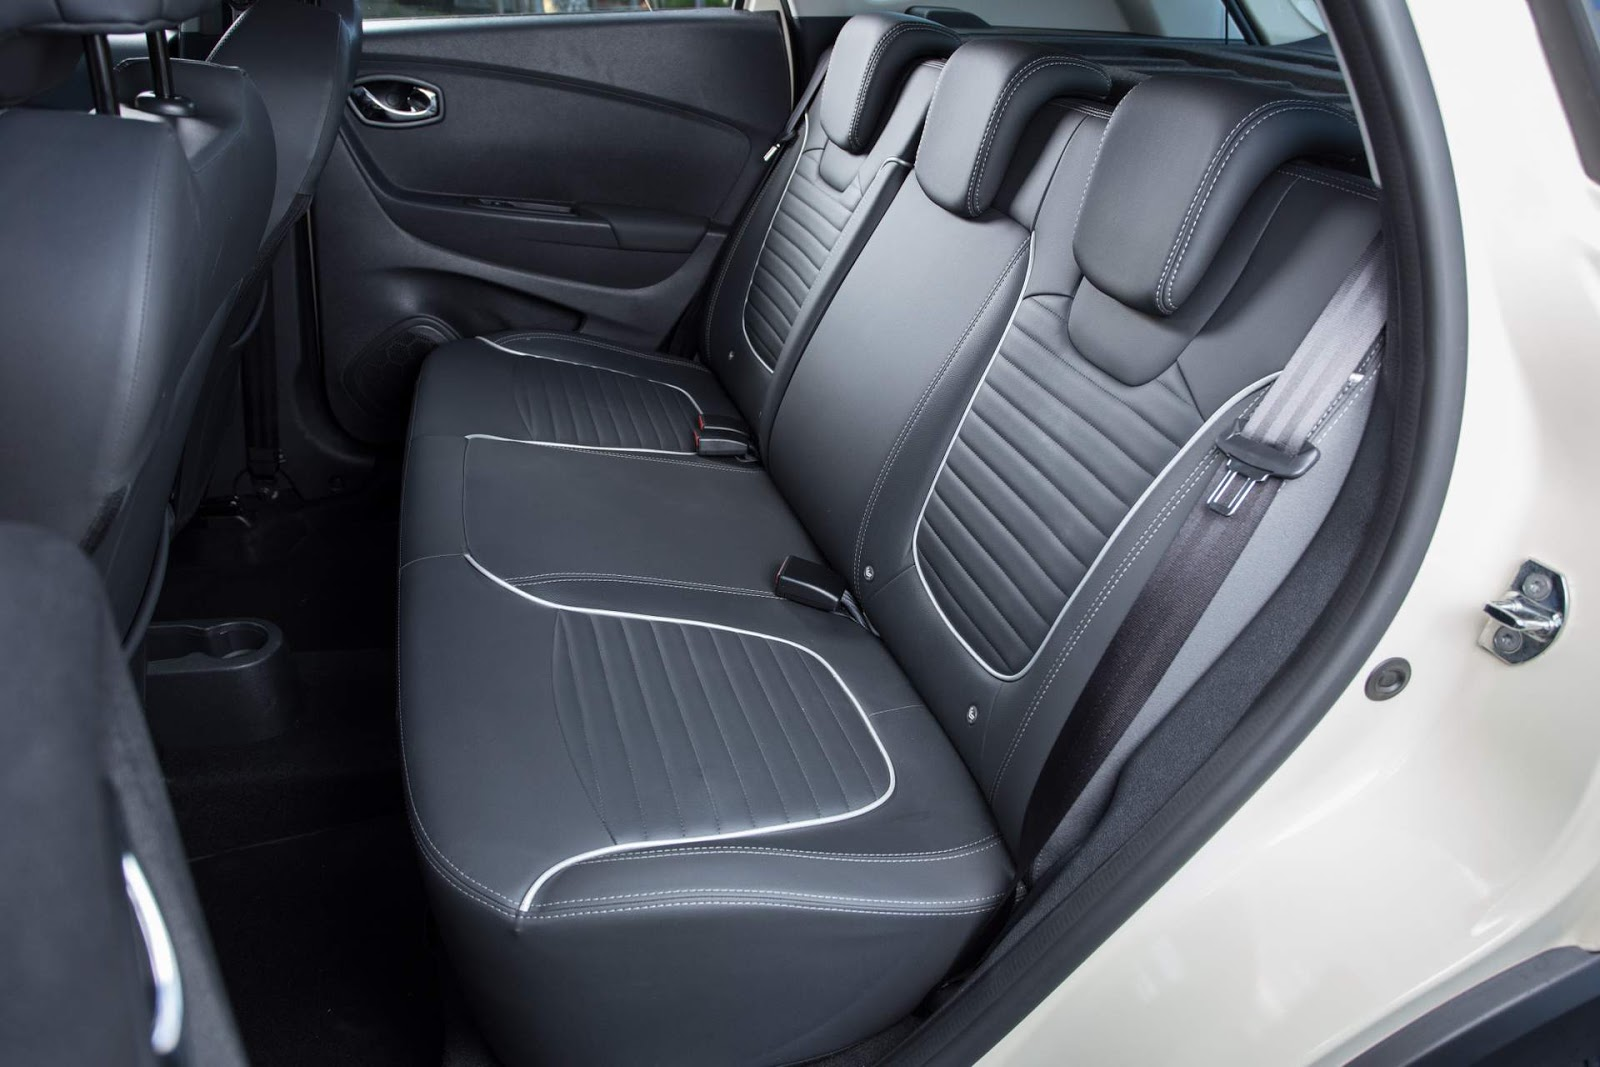 100 renault captur interior 2017 facelifted renault for Interior renault captur